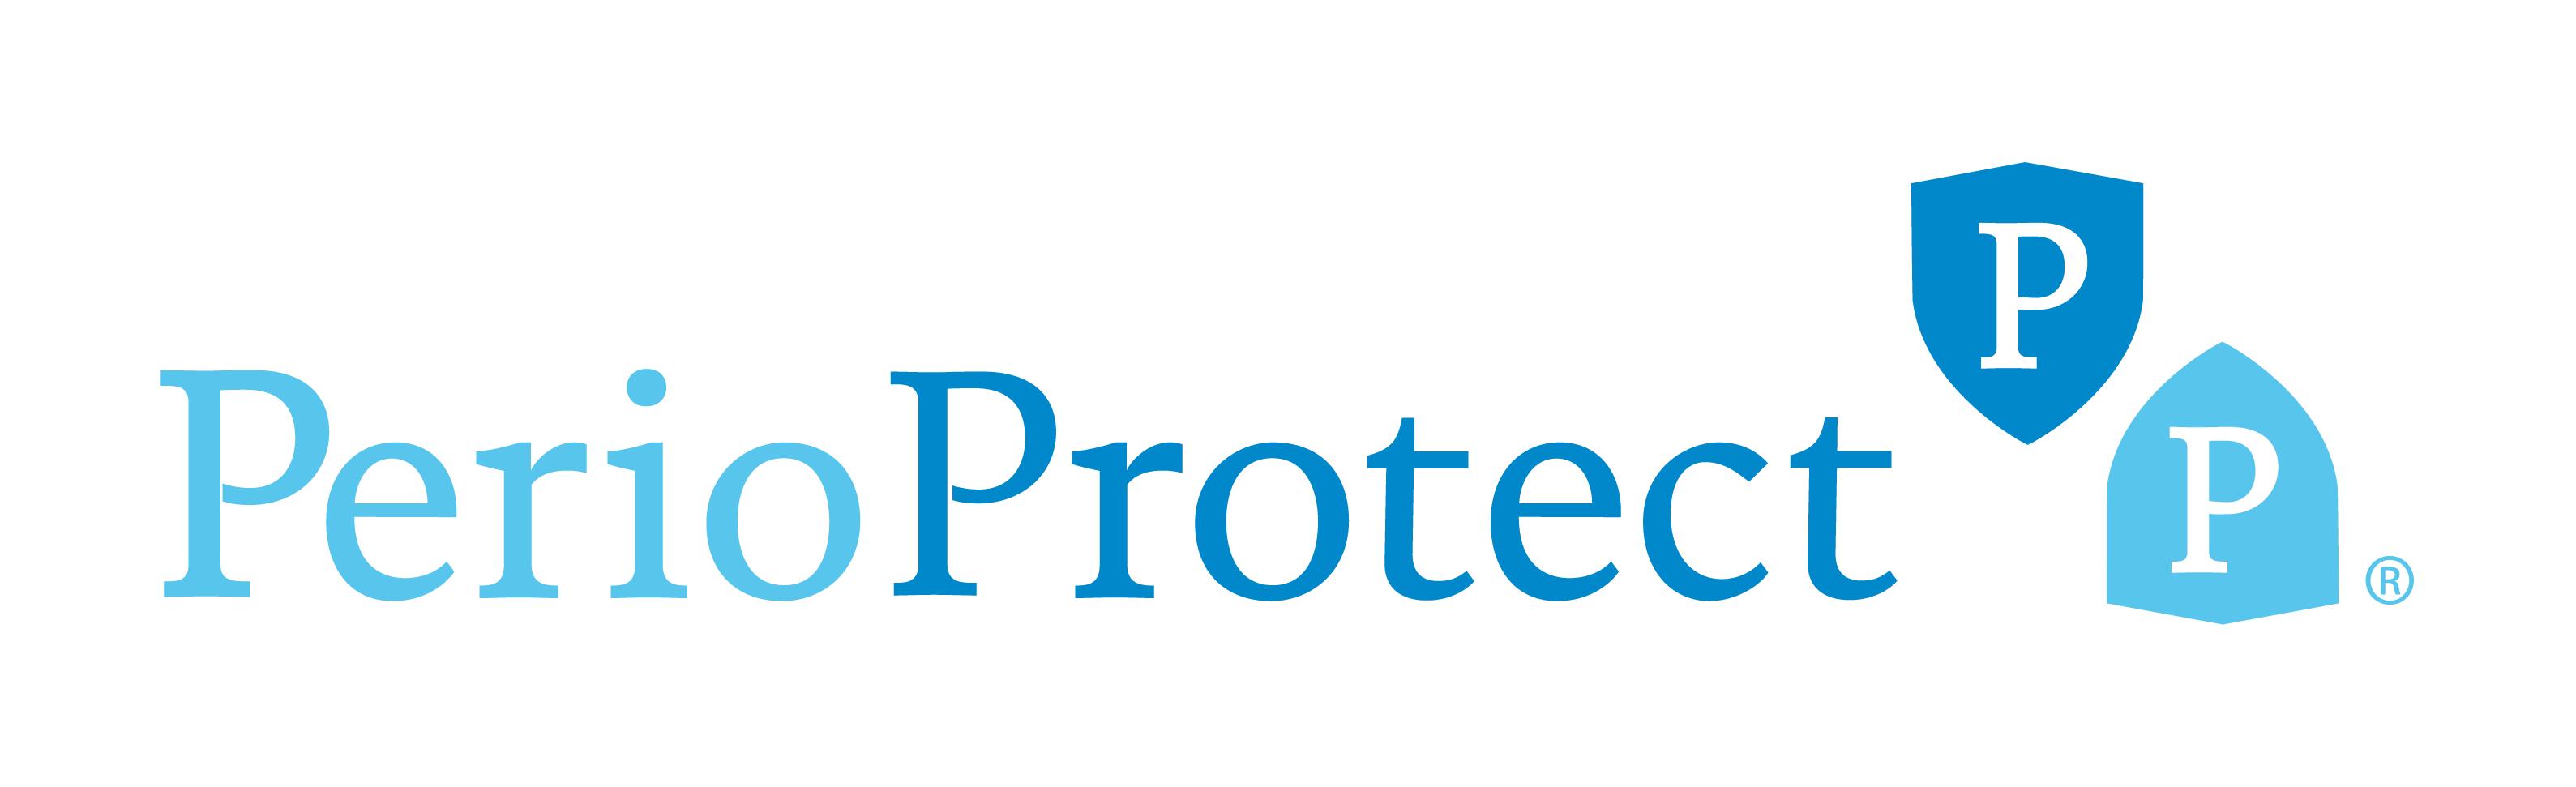 Perio Protect Logo